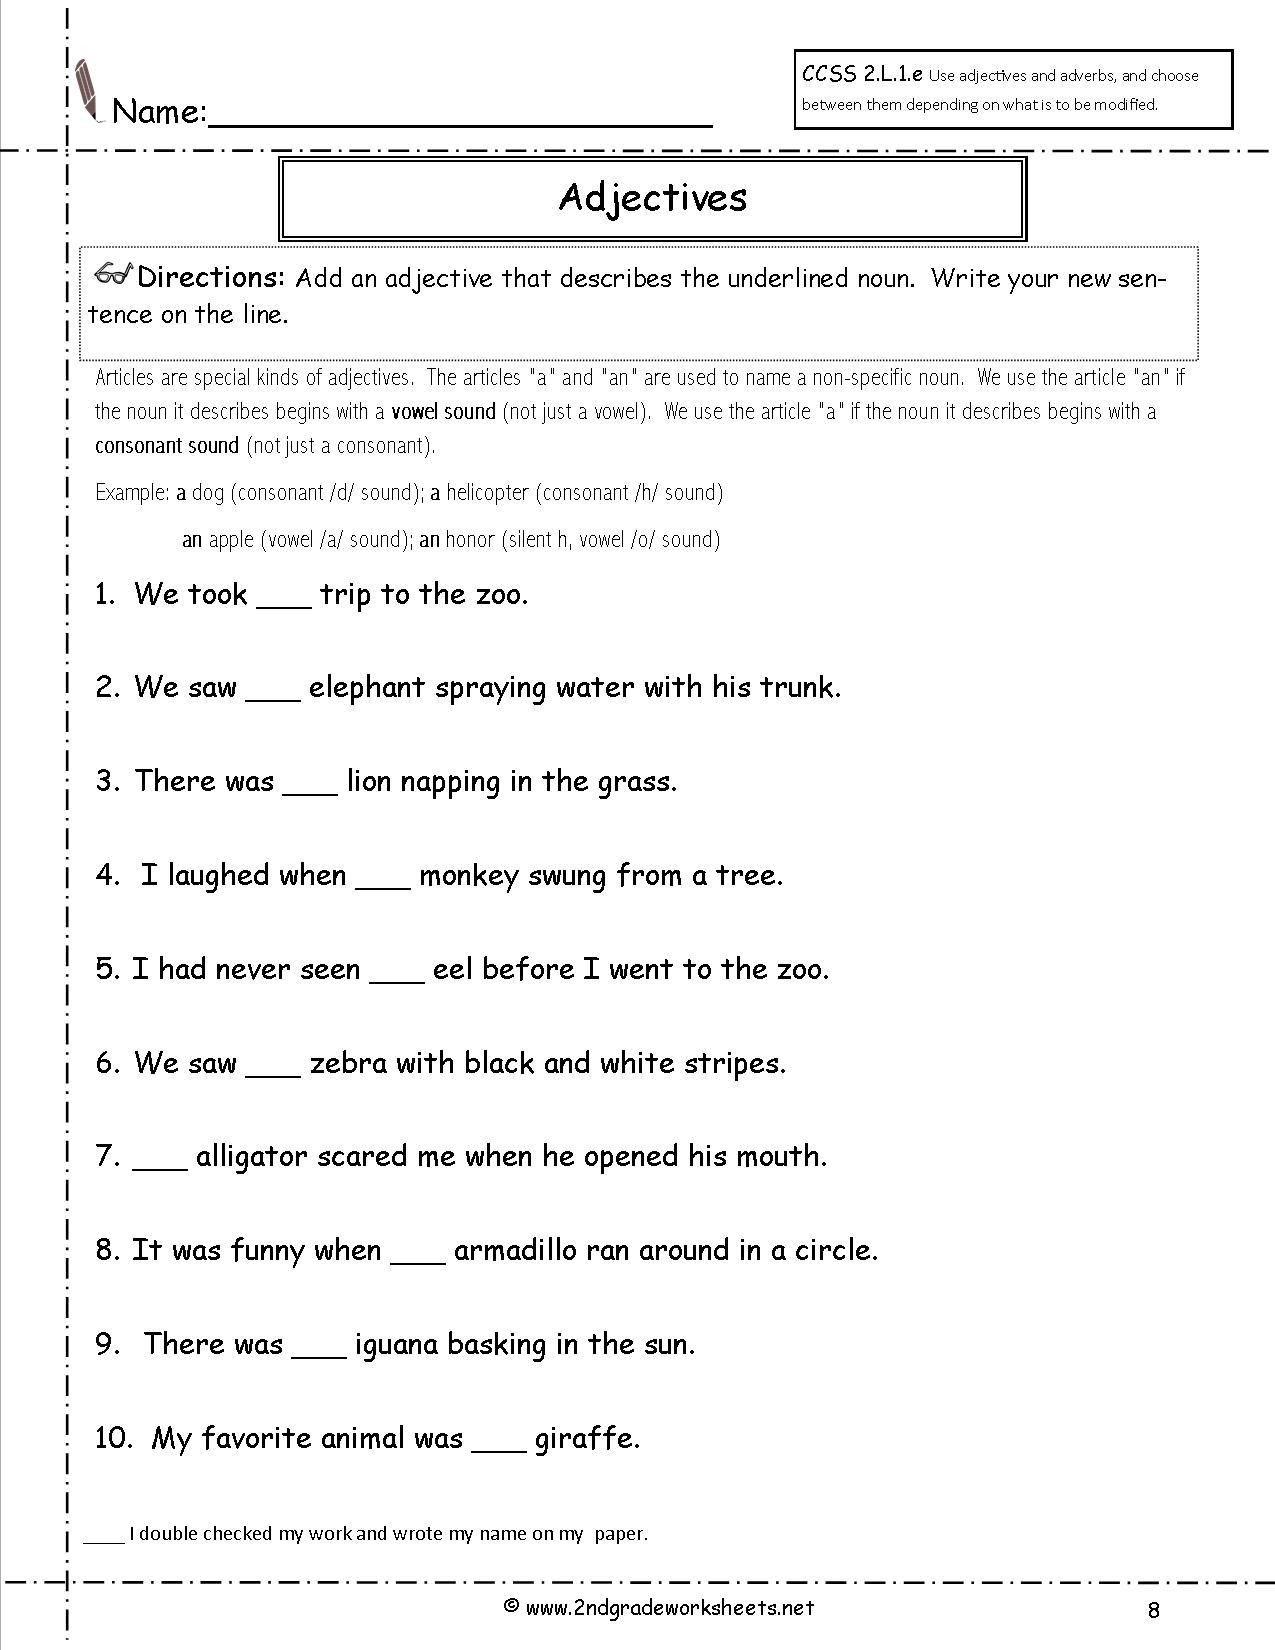 11 Accomplished Noun Worksheets Di